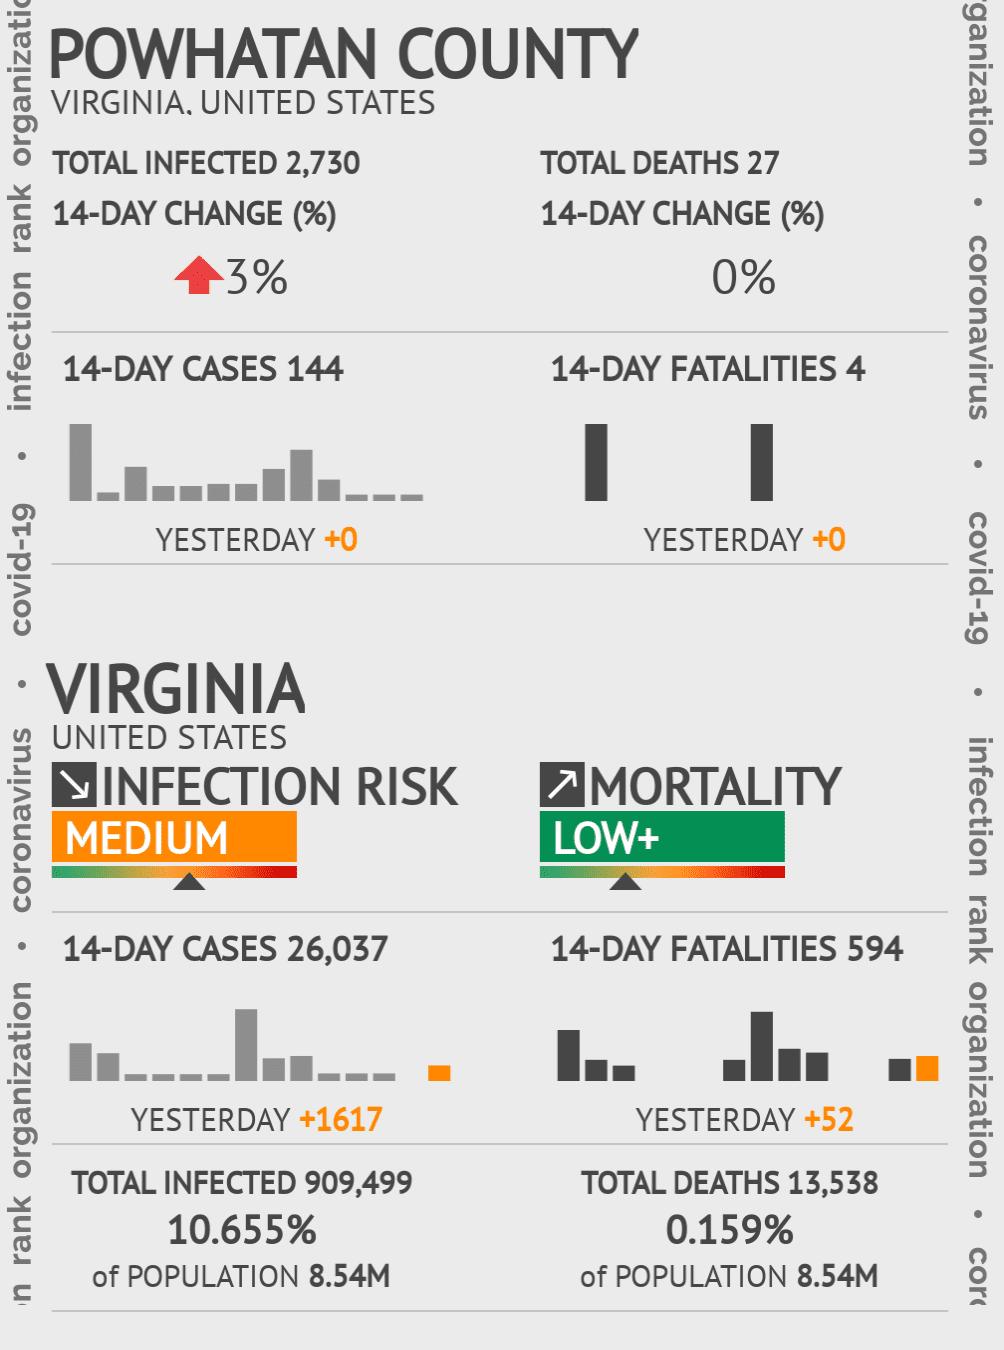 Powhatan County Coronavirus Covid-19 Risk of Infection on July 24, 2021